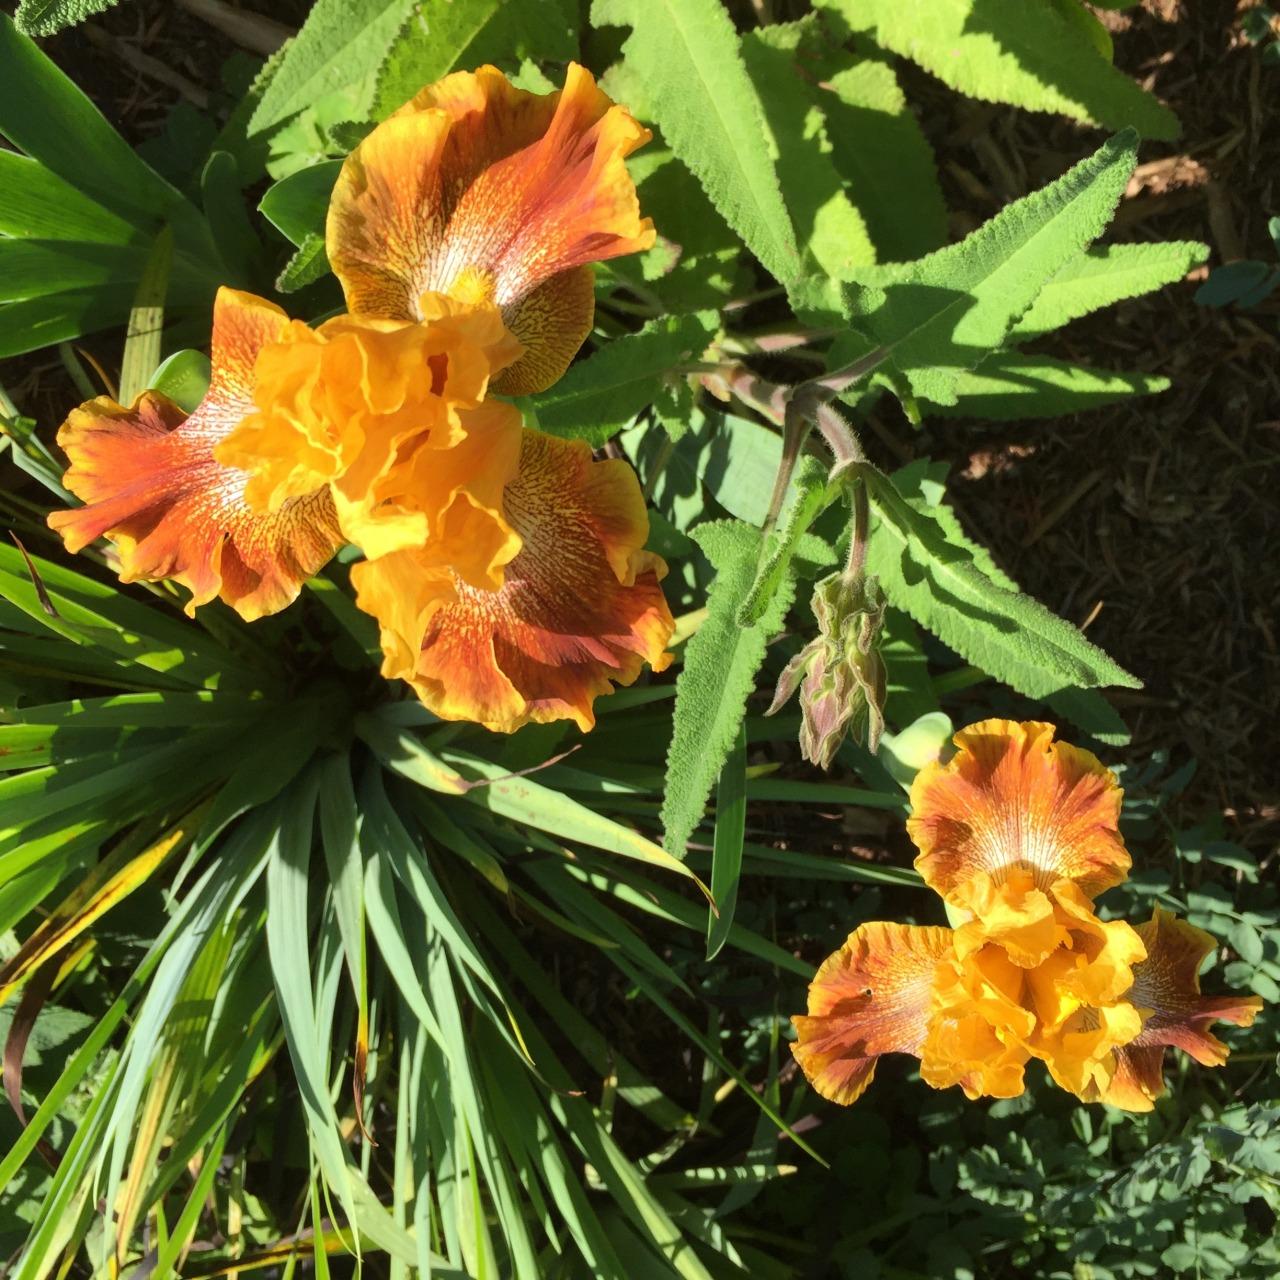 April in San Diego. Irises in the streetside garden.